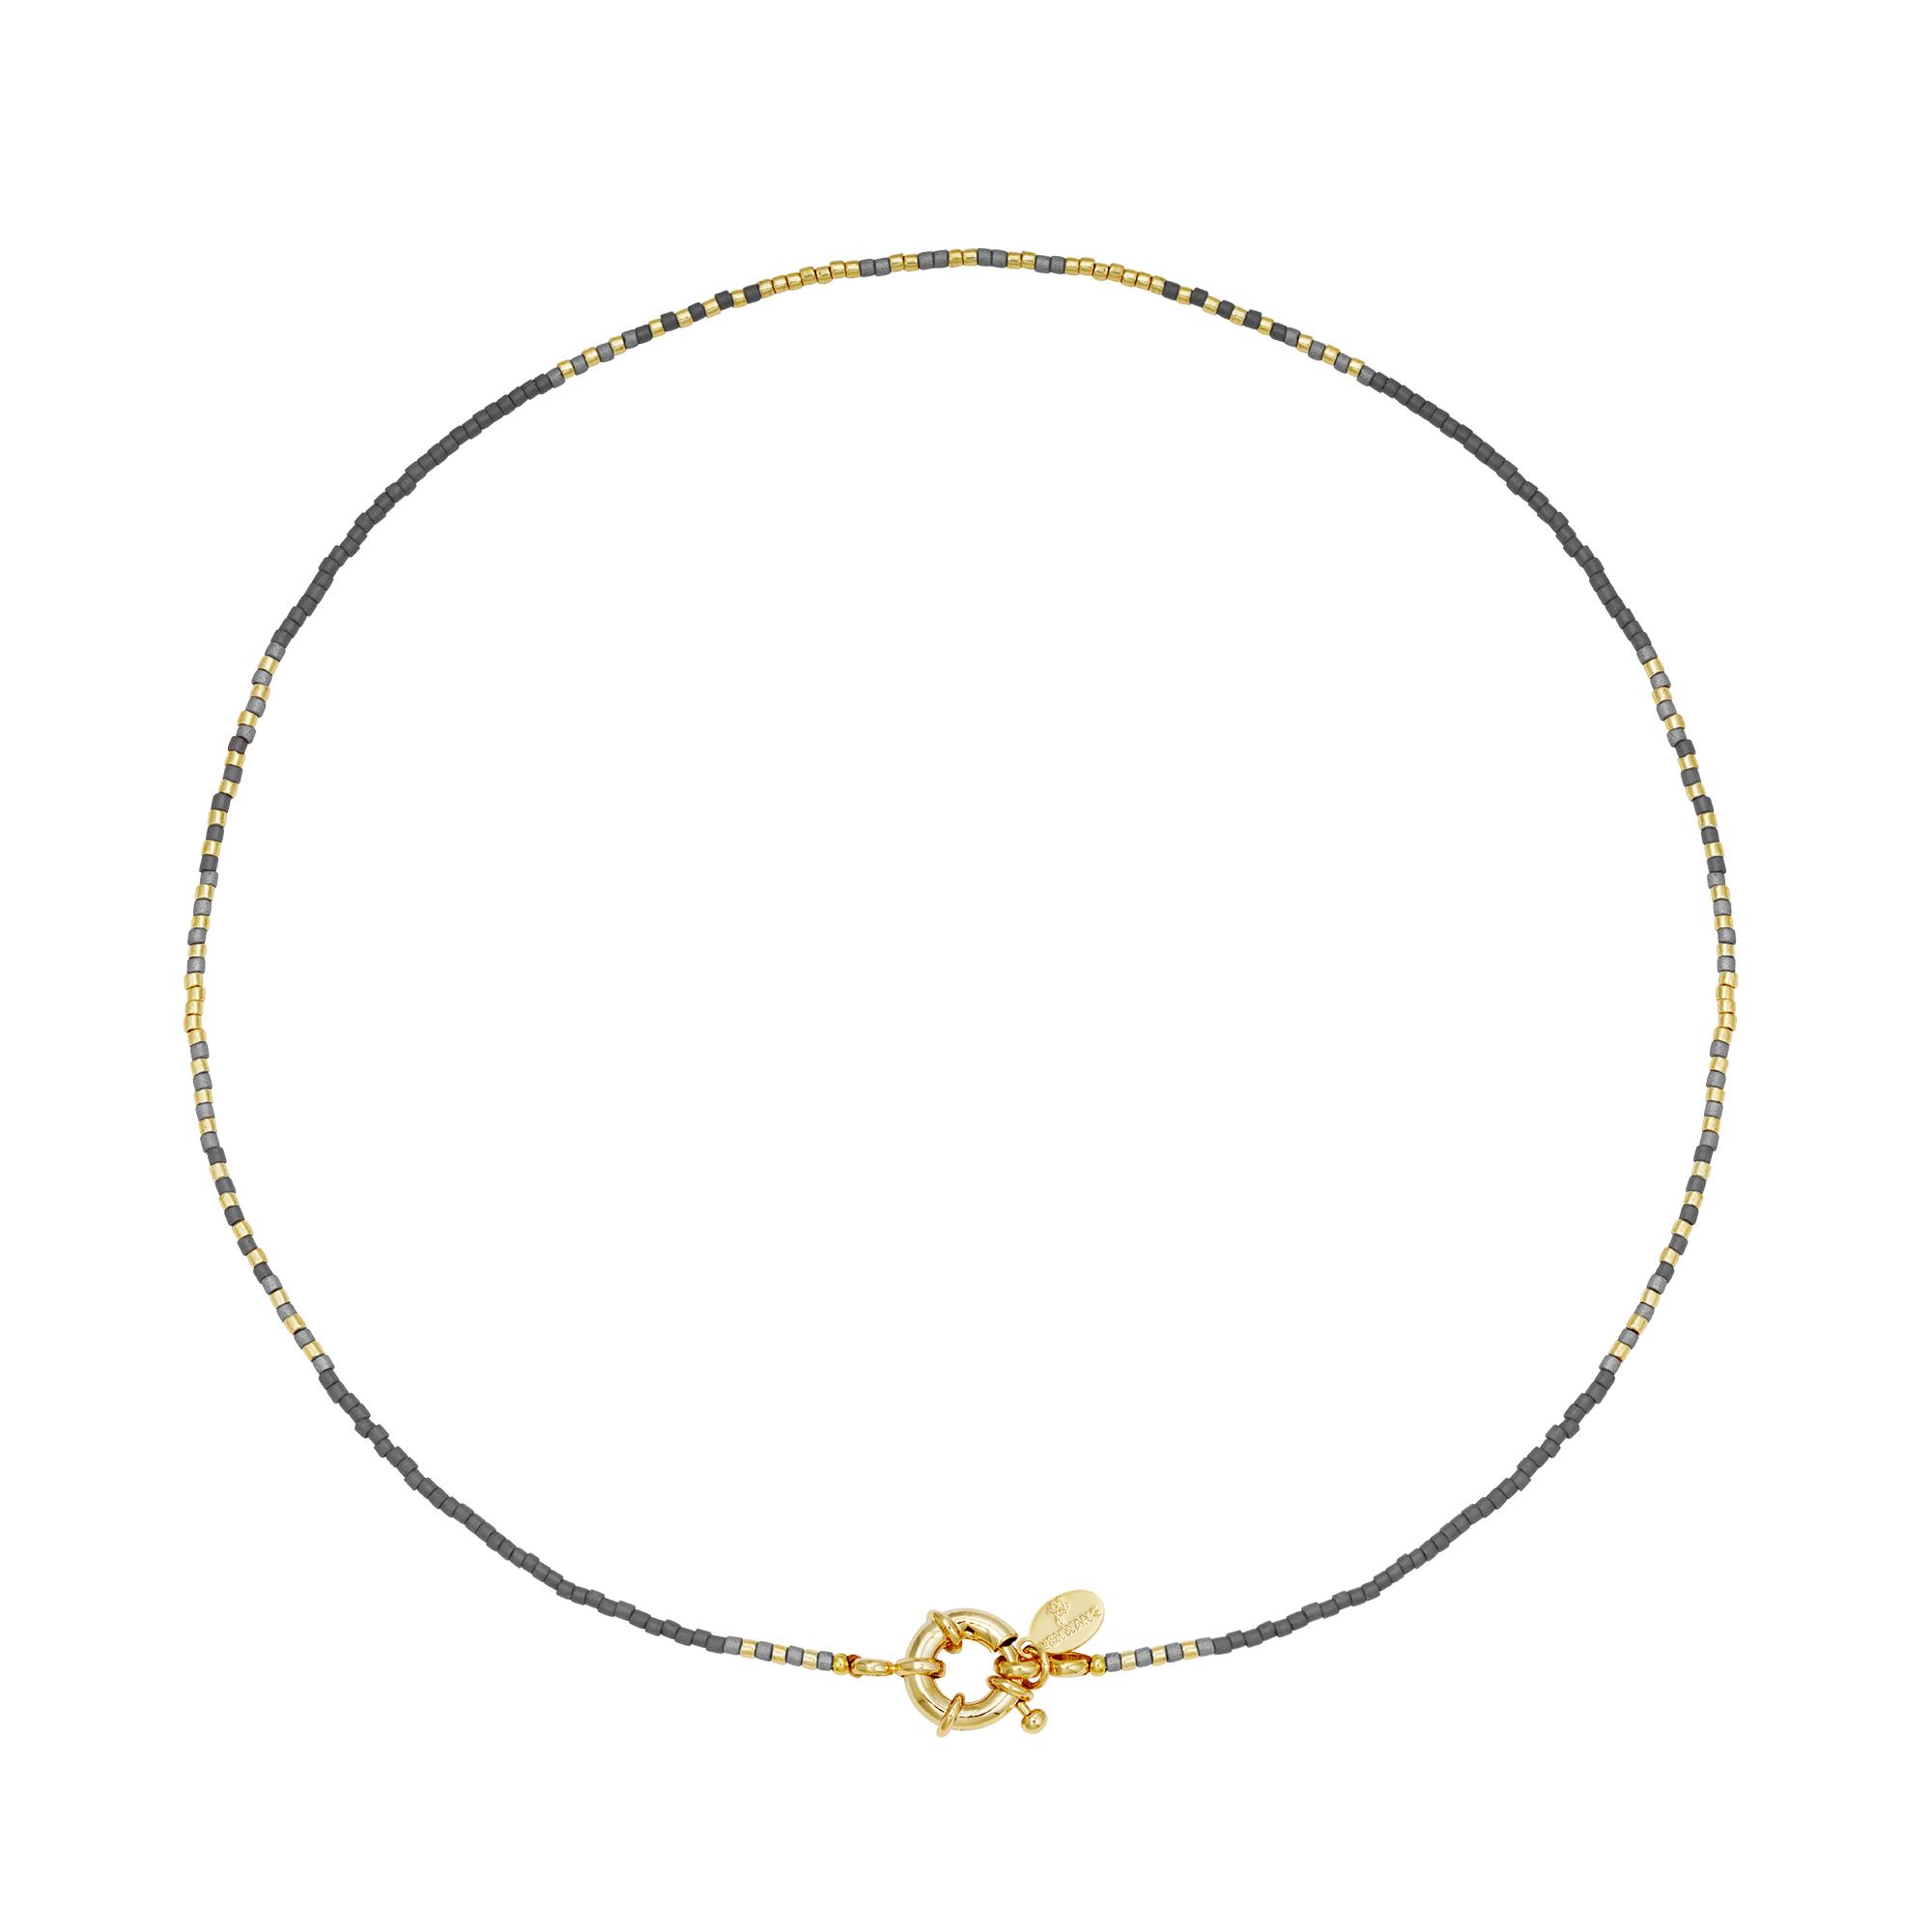 Halskette delicate